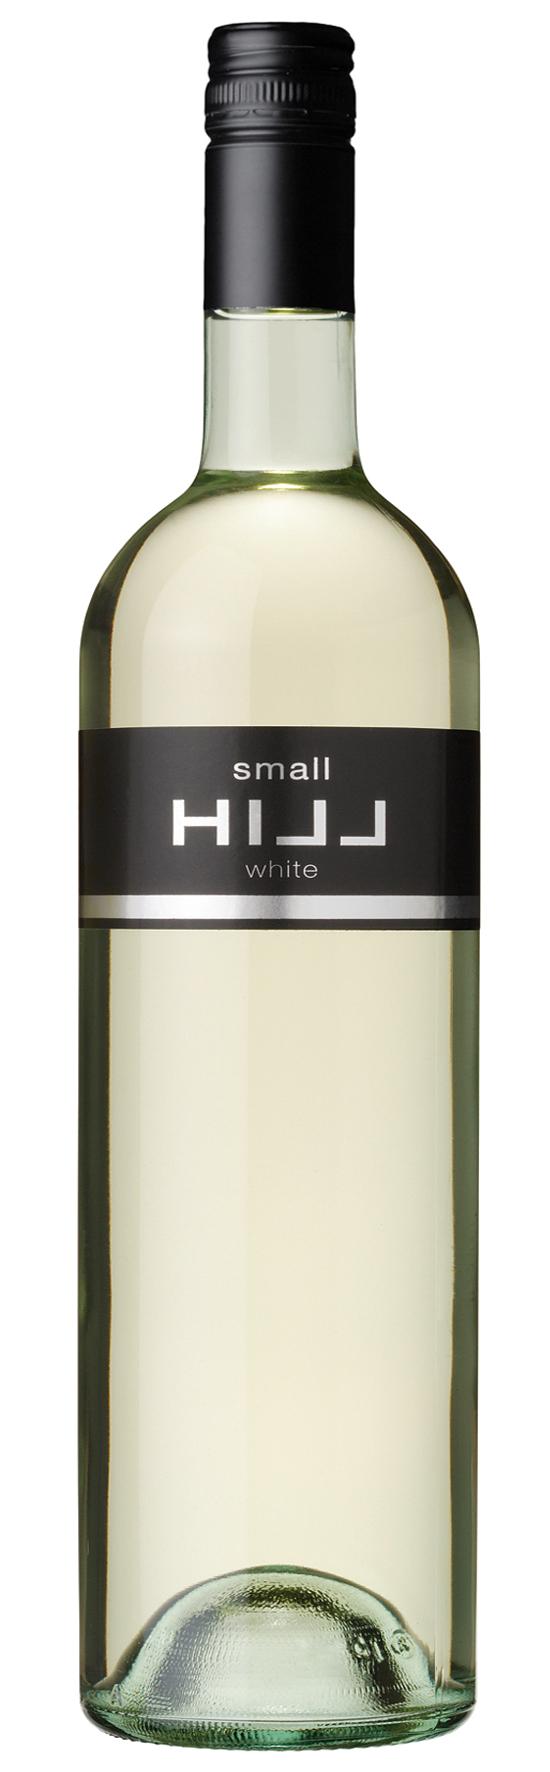 SMALL HILL WHITE Leo Hillinger 2015